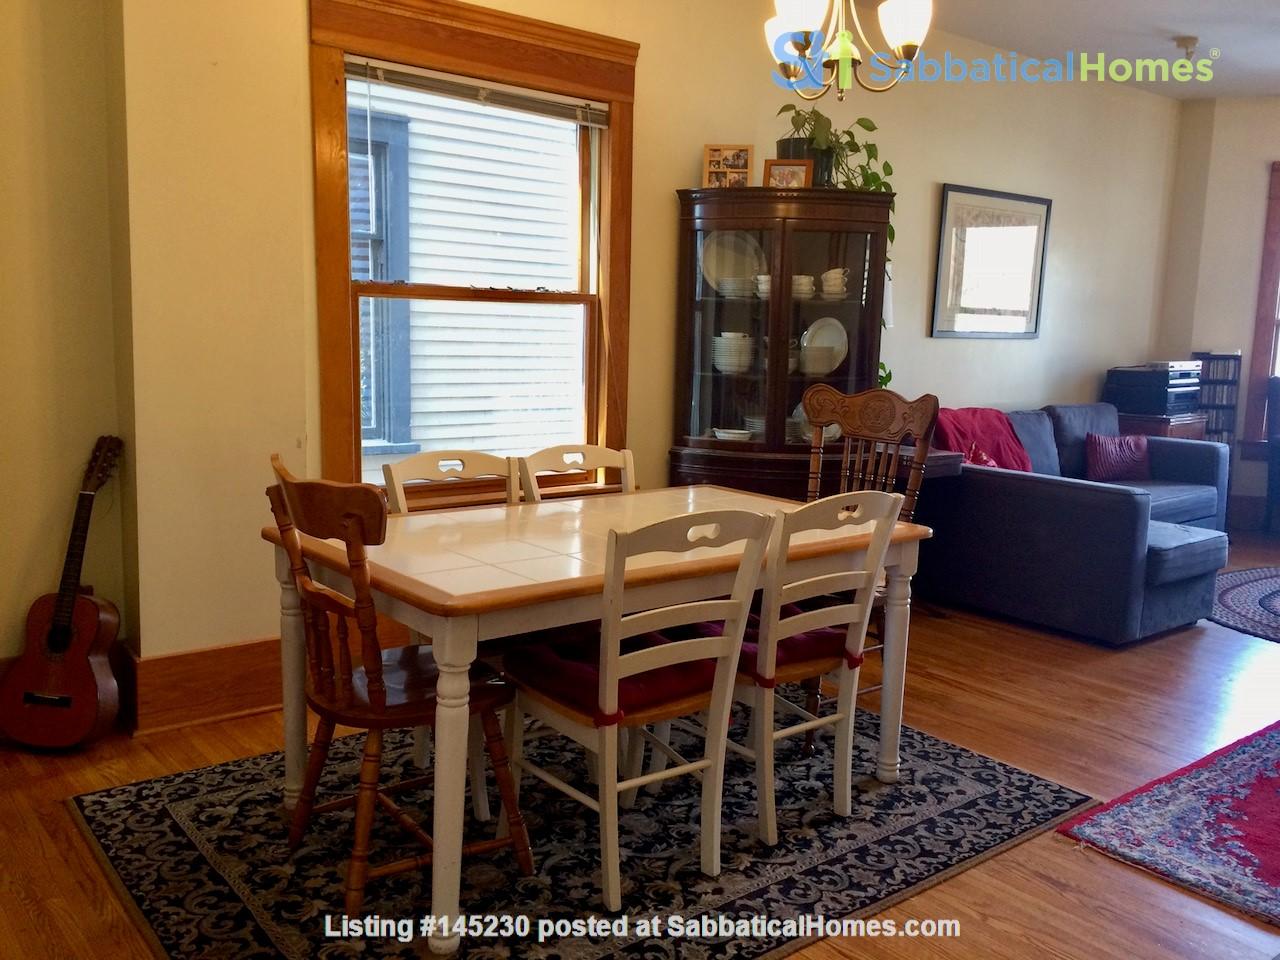 Beautiful historic home in sought after Calgary neighbourhood Home Rental in Calgary, Alberta, Canada 3